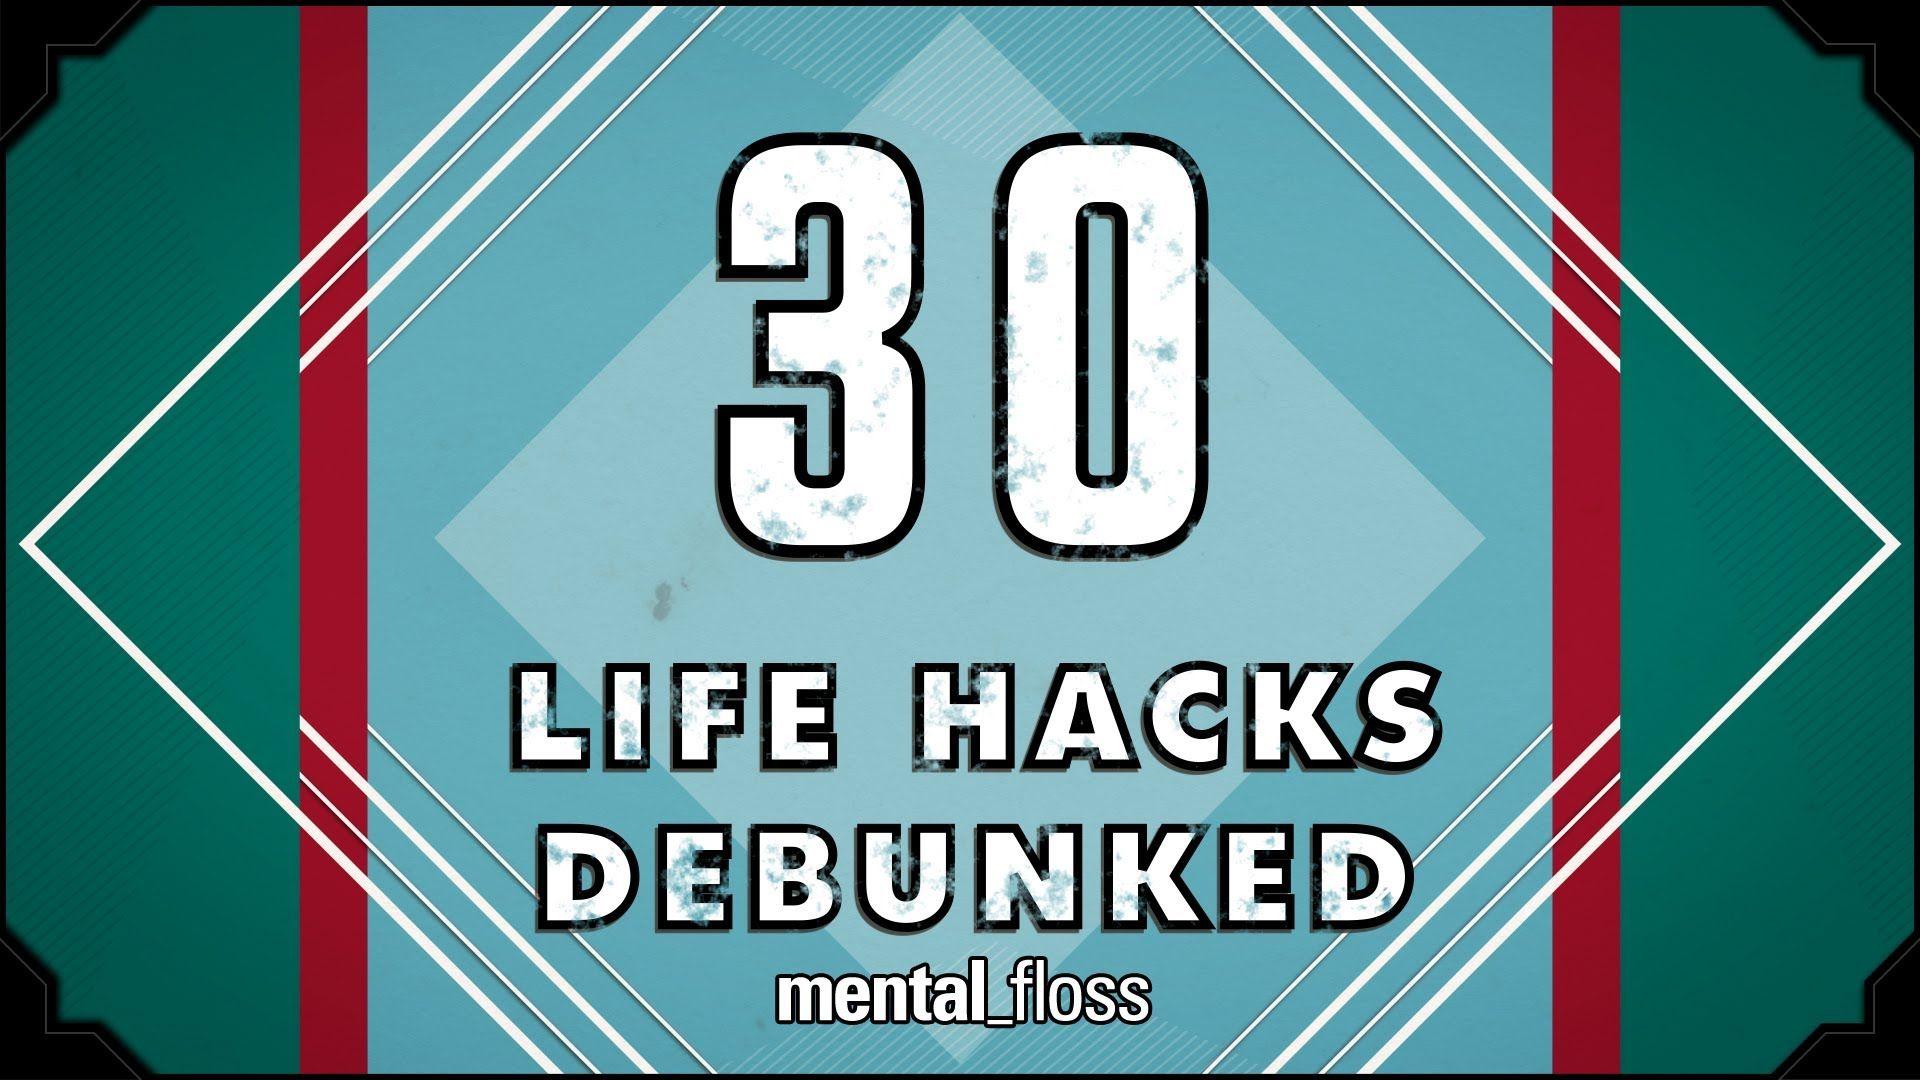 30 Life Hacks Debunked - mental_floss on YouTube (Ep. 30)